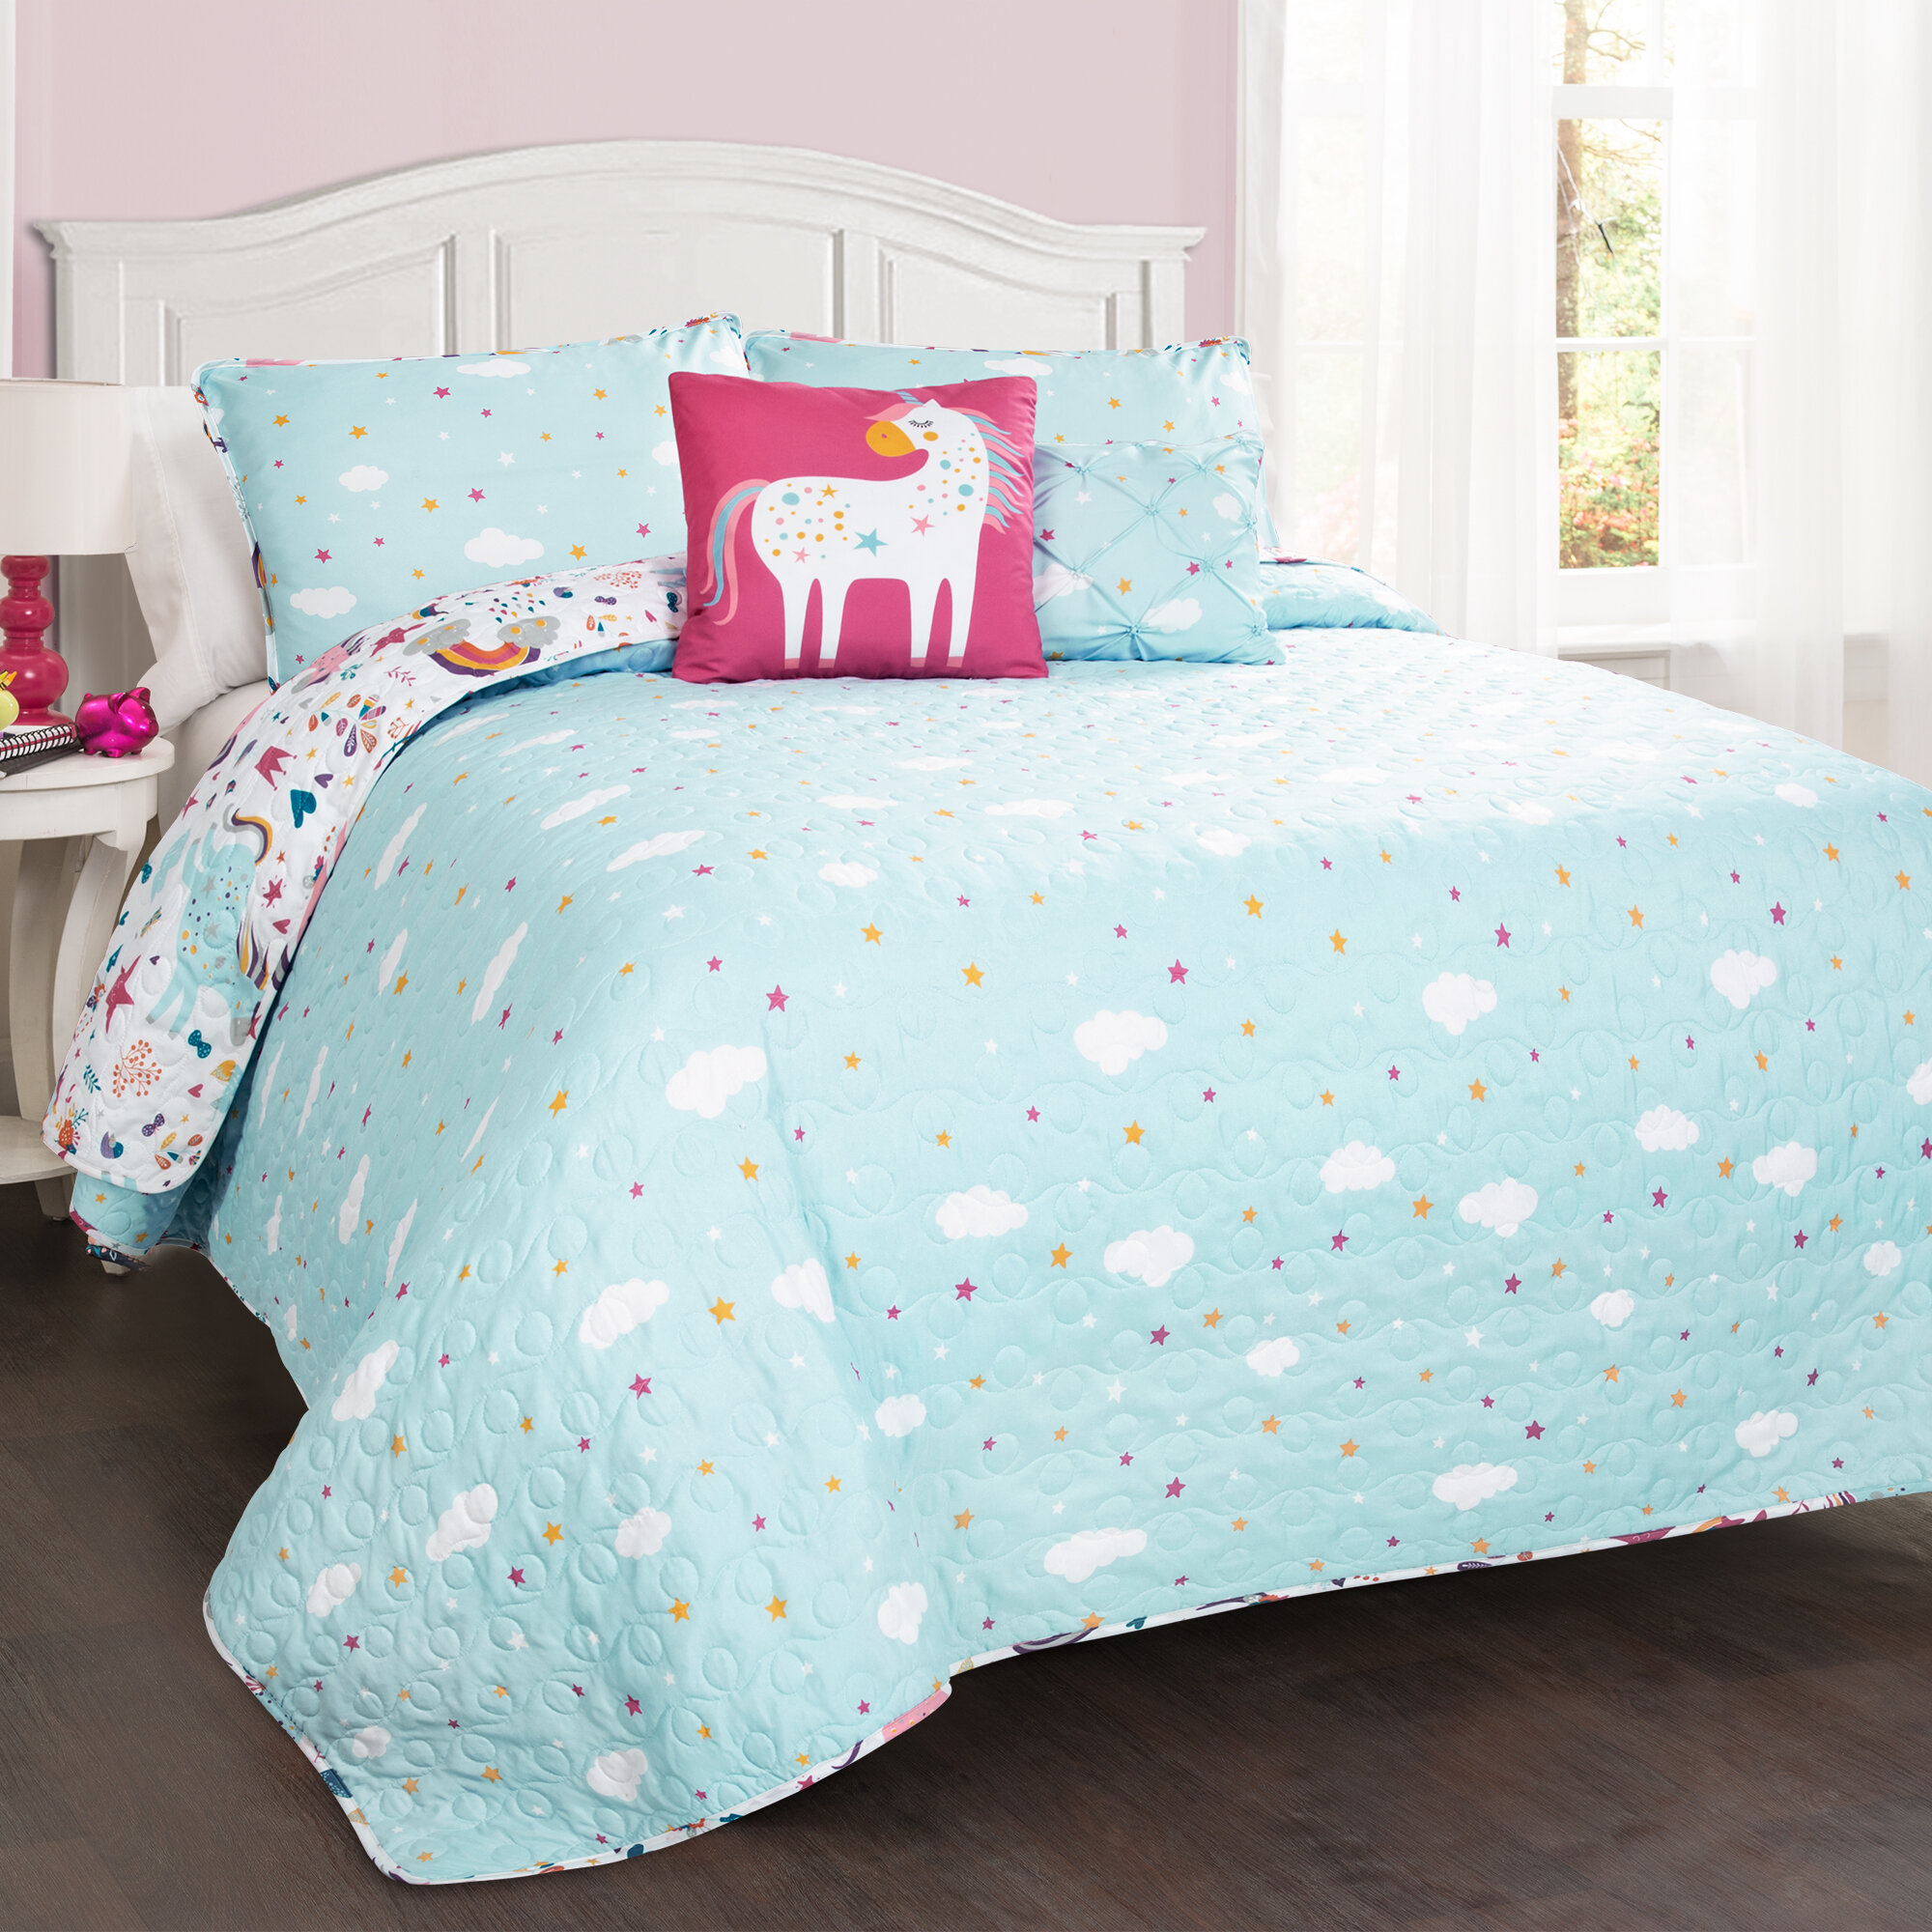 UNICORN Comforter Sham /& Hearts Sheet Set FULL TWIN SIZE Bed In A Bag Pink Girls